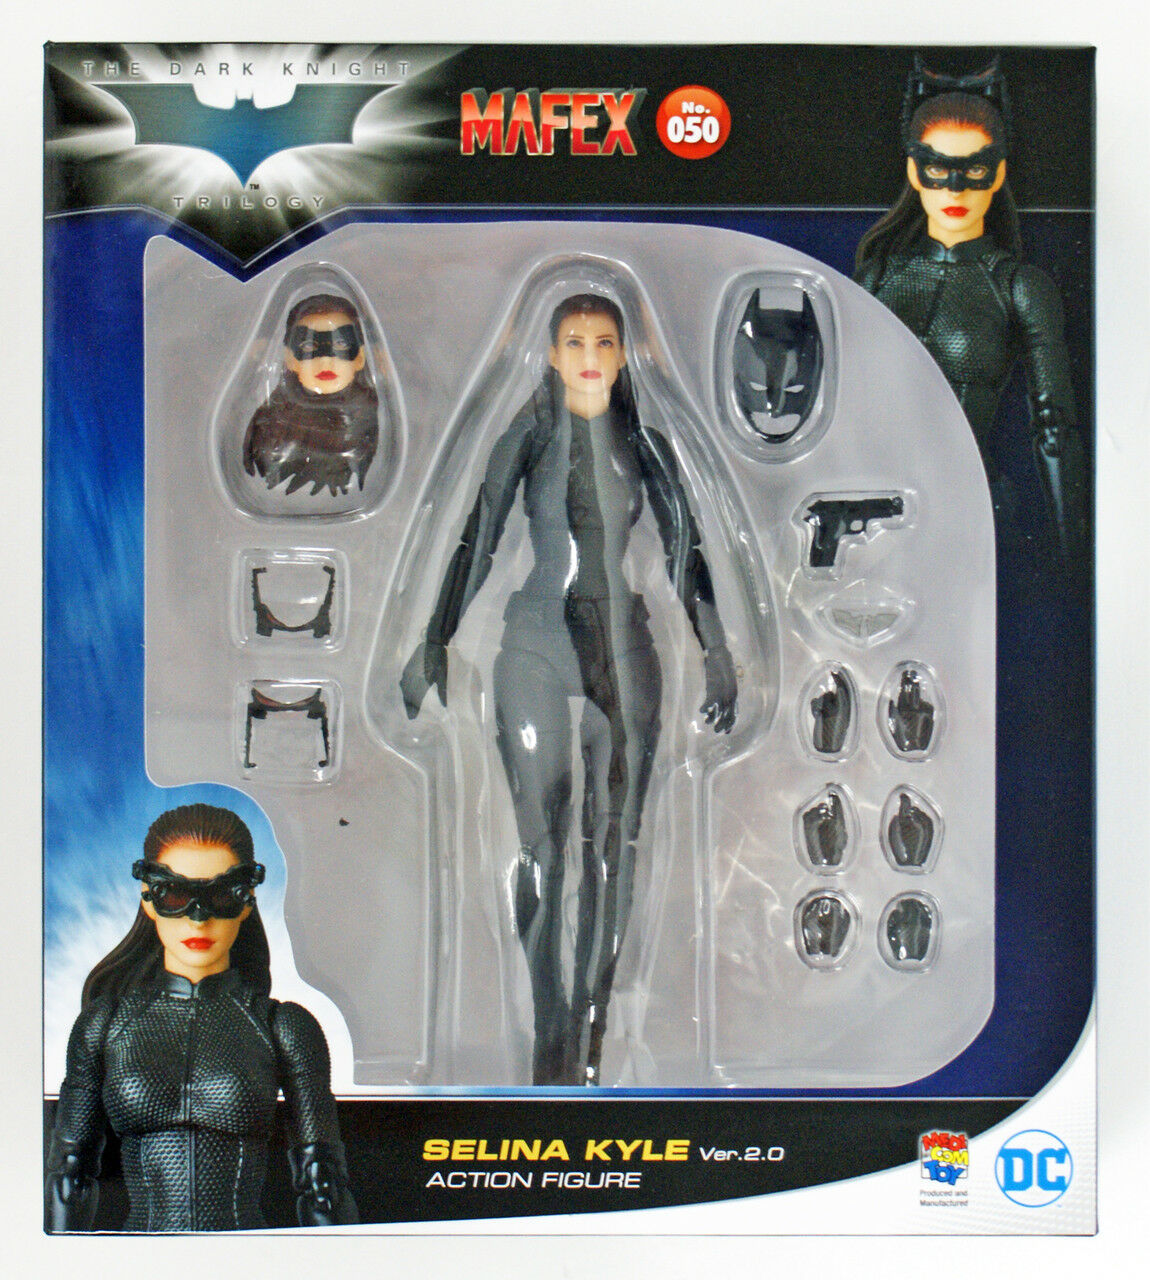 Medicom MAFEX 050 Batman The The The Dark Knight Rises Selina Kyle Ver 2.0 Action Figure 235bda